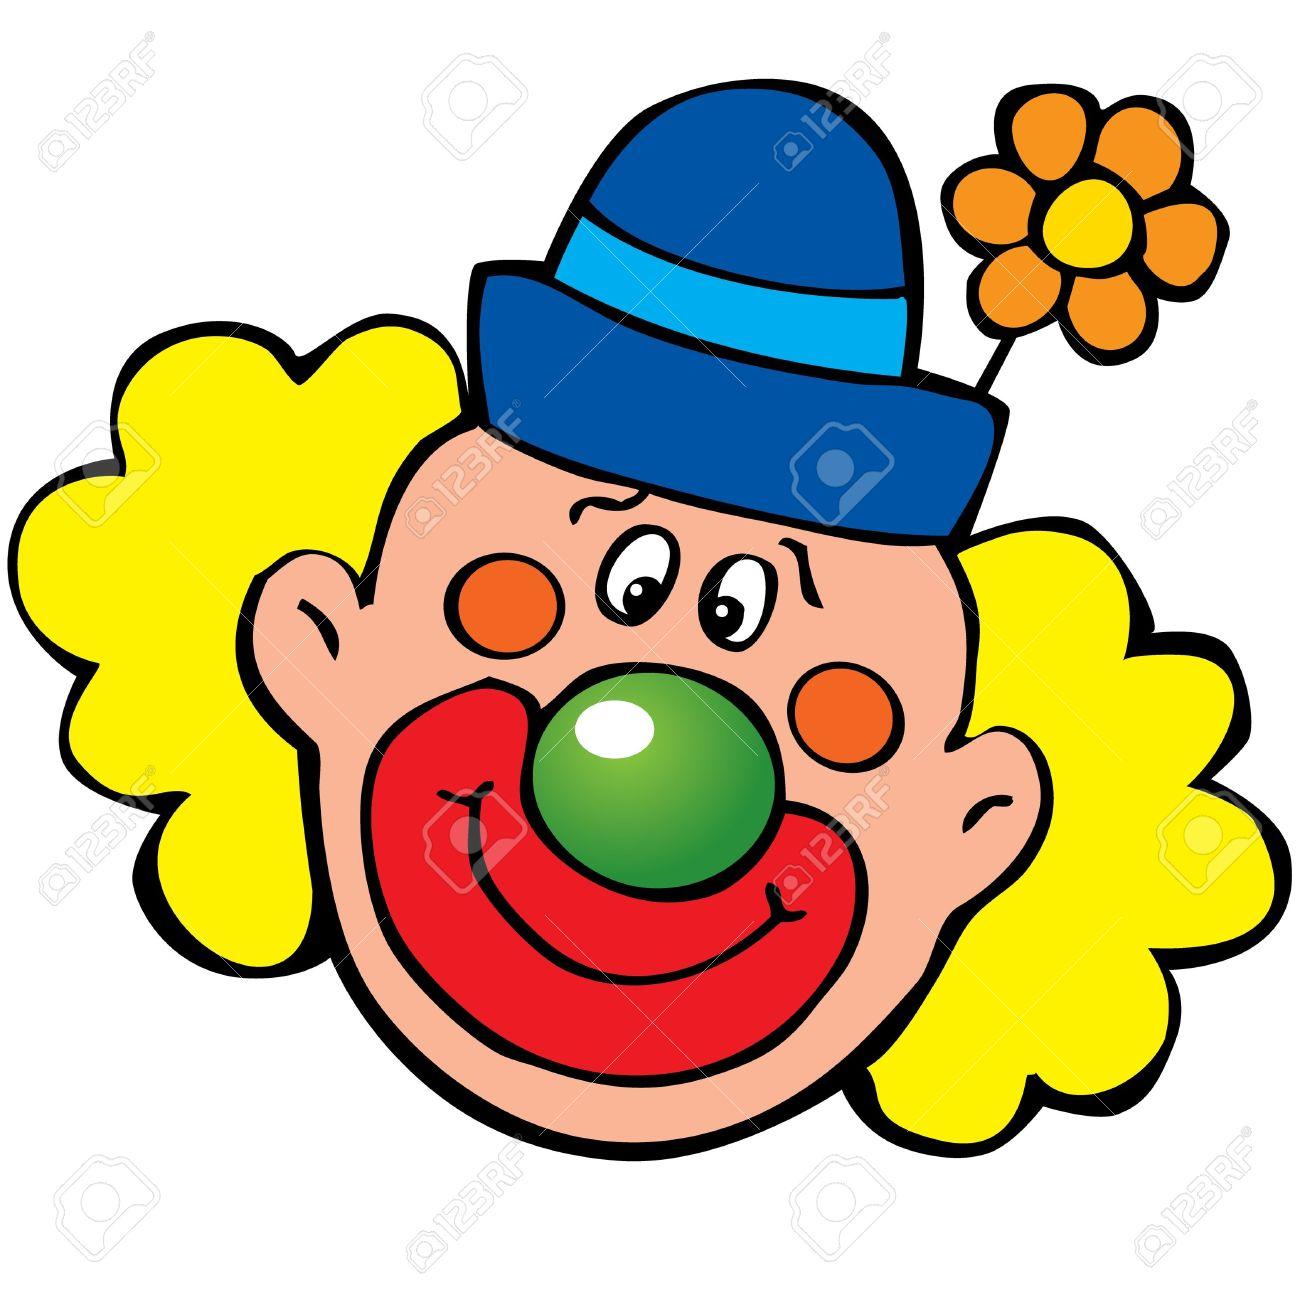 Clown kopf clipart. Clipartfest hair wig happy